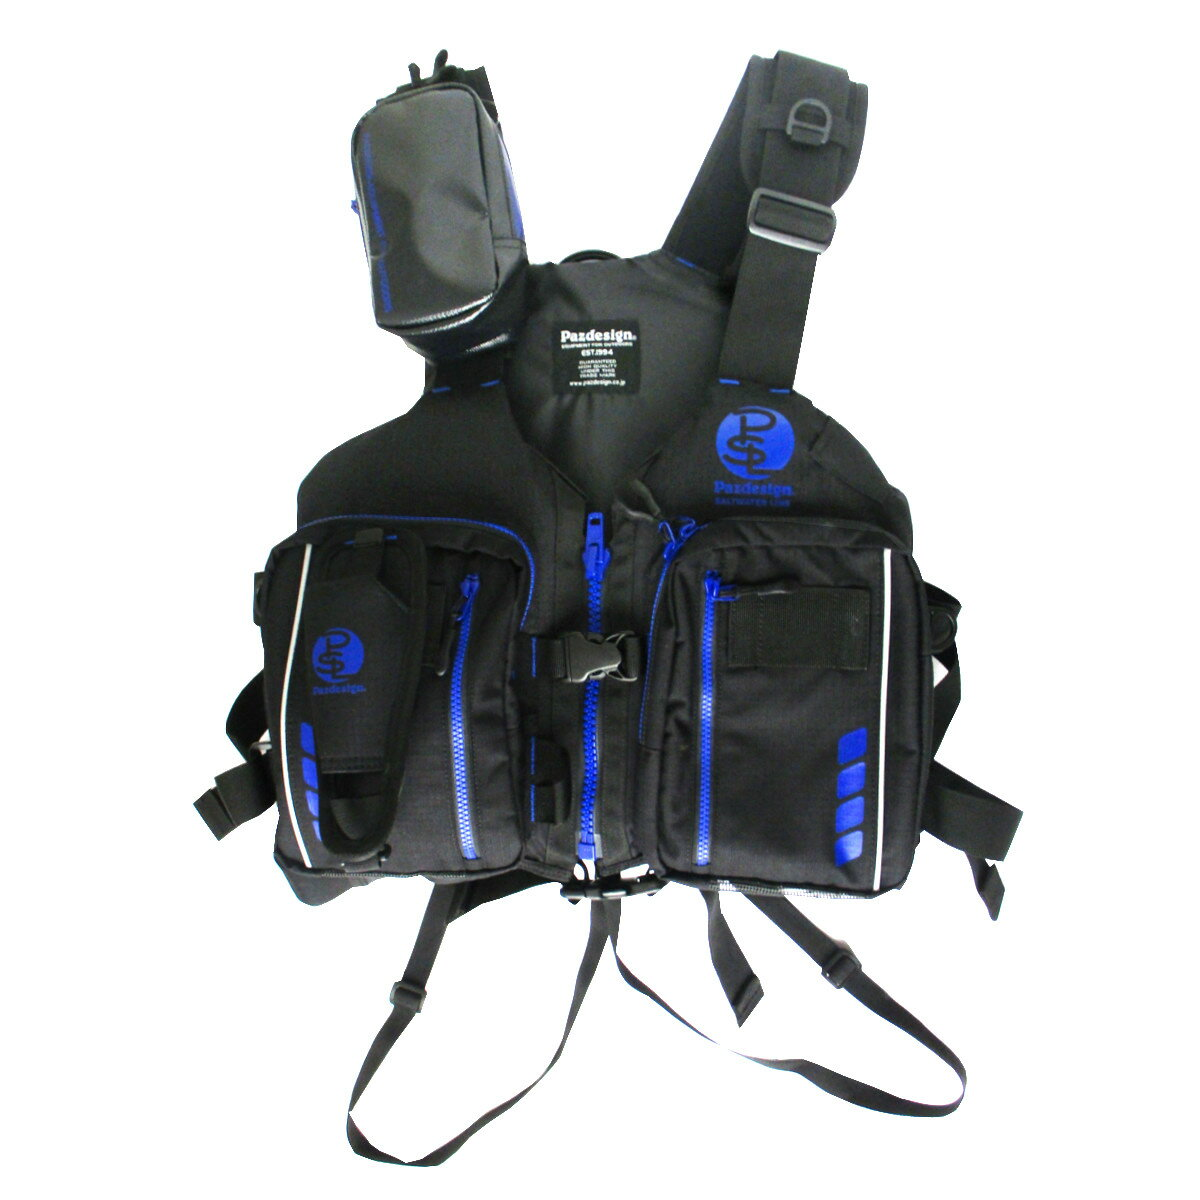 Pazdesign アルティメット V-3 SLV-025 フリー ブラック/ブルー(東日本店)